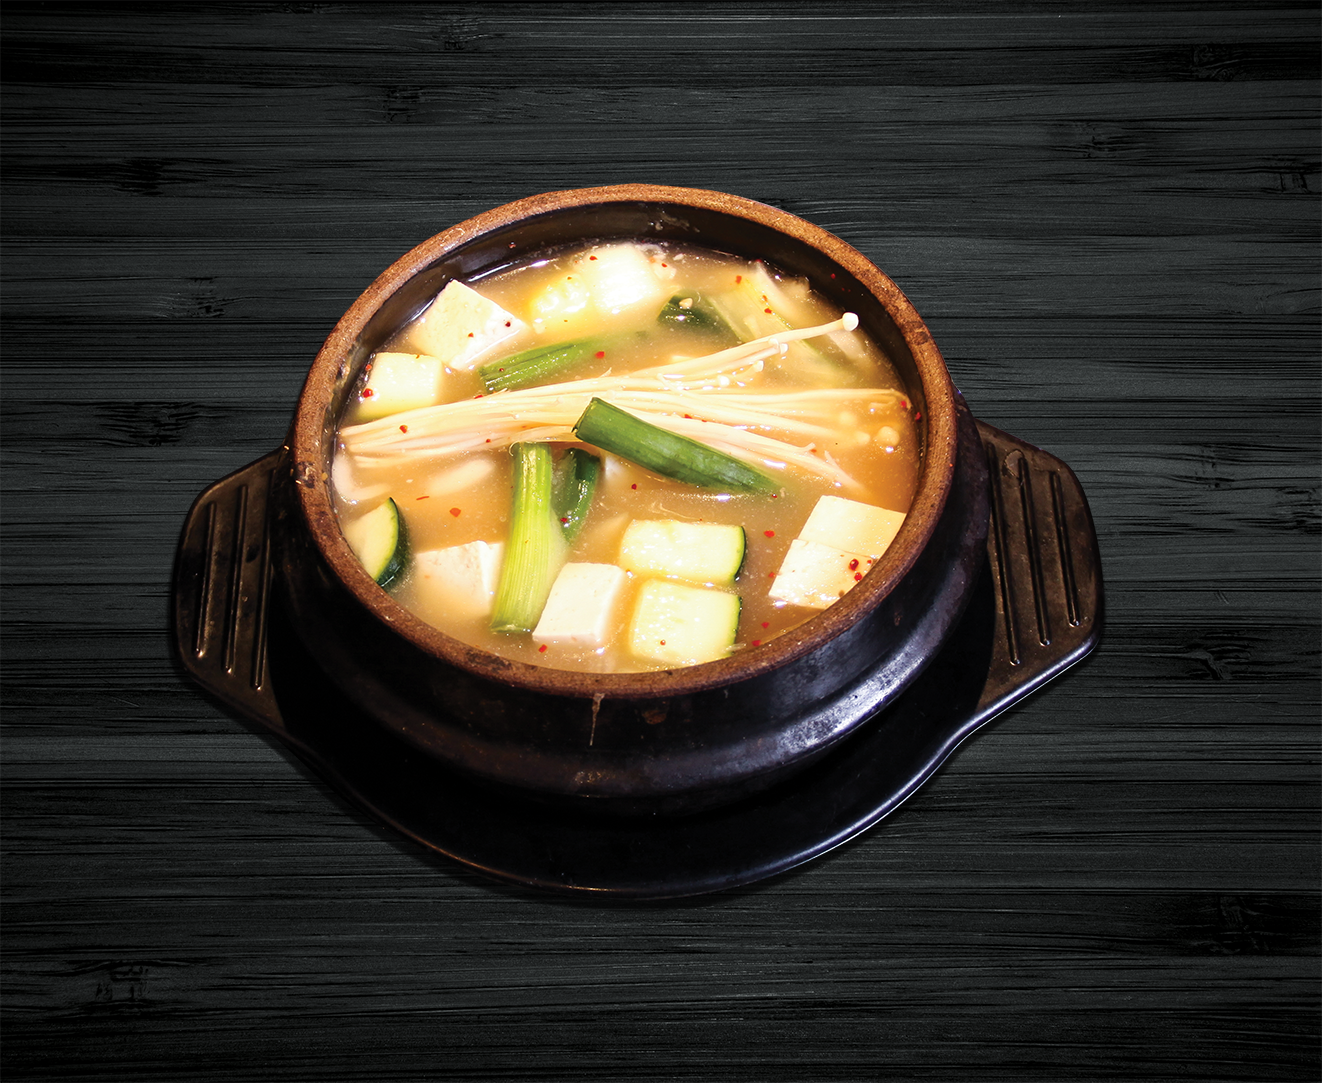 Soybean Paste Stew